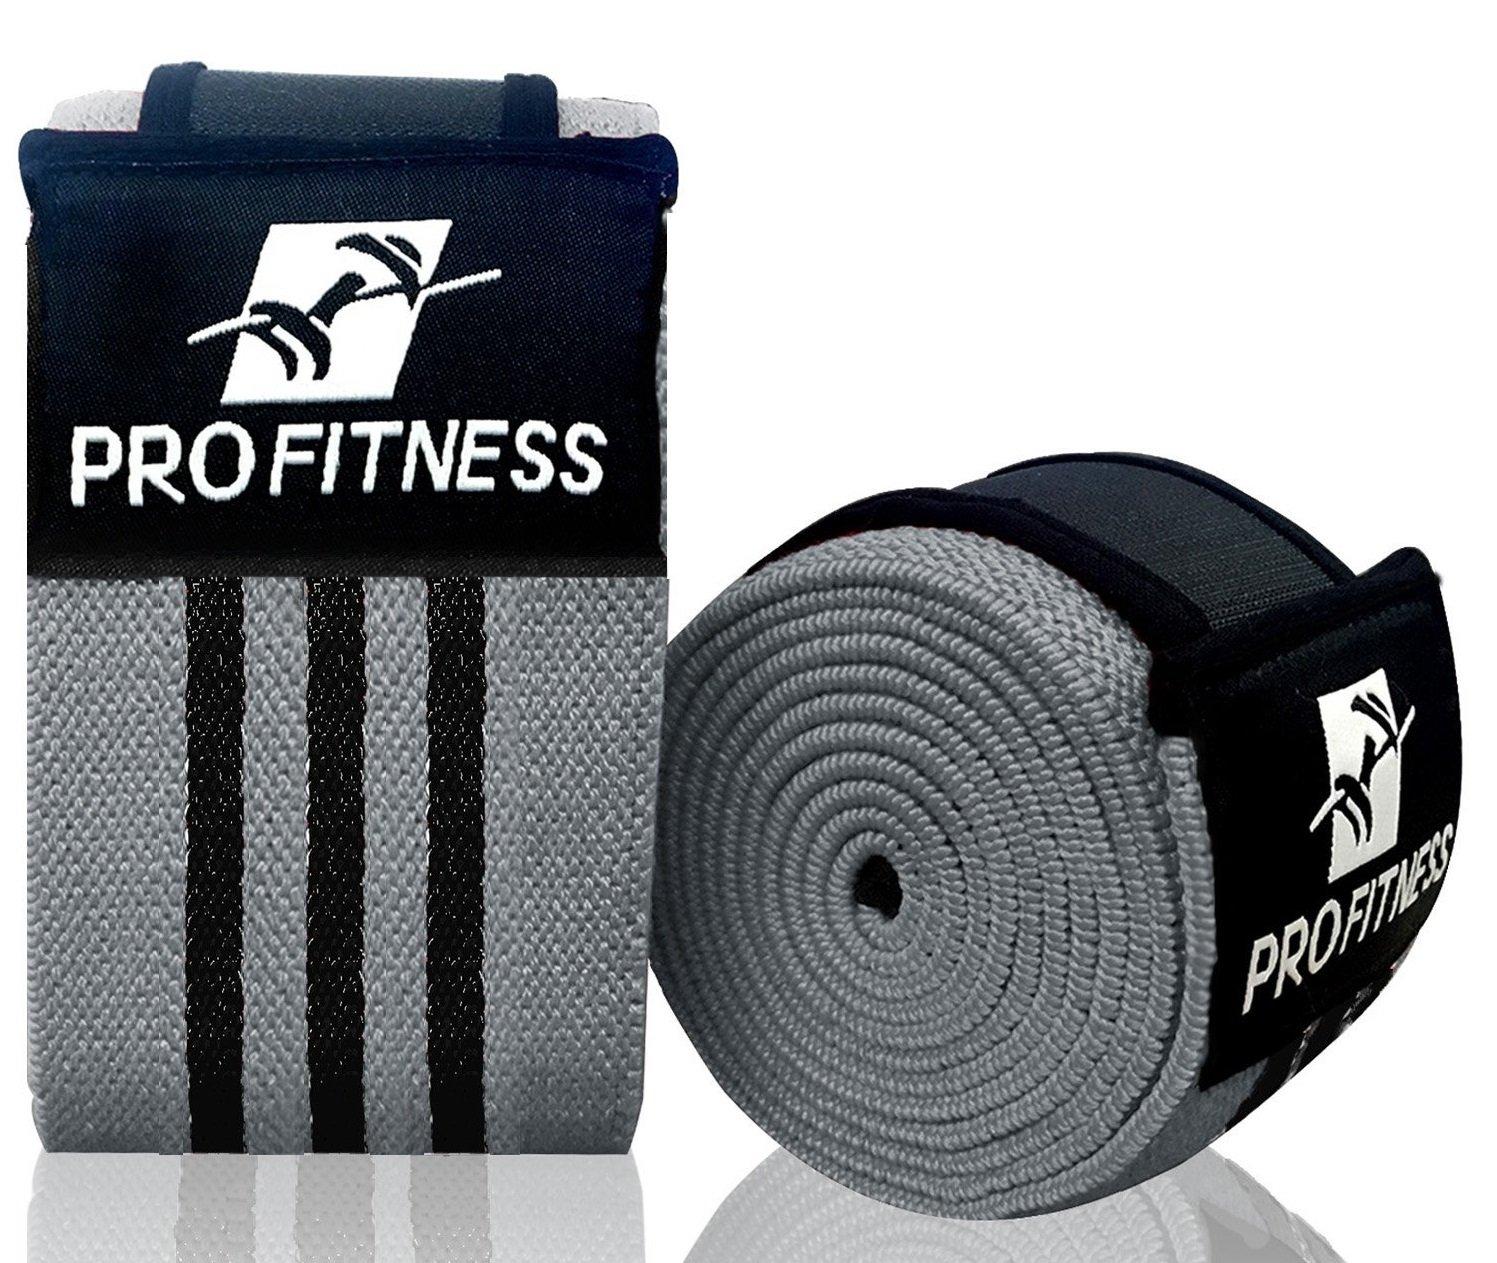 ProFitness Weightlifting Knee Wraps Pair Image 1